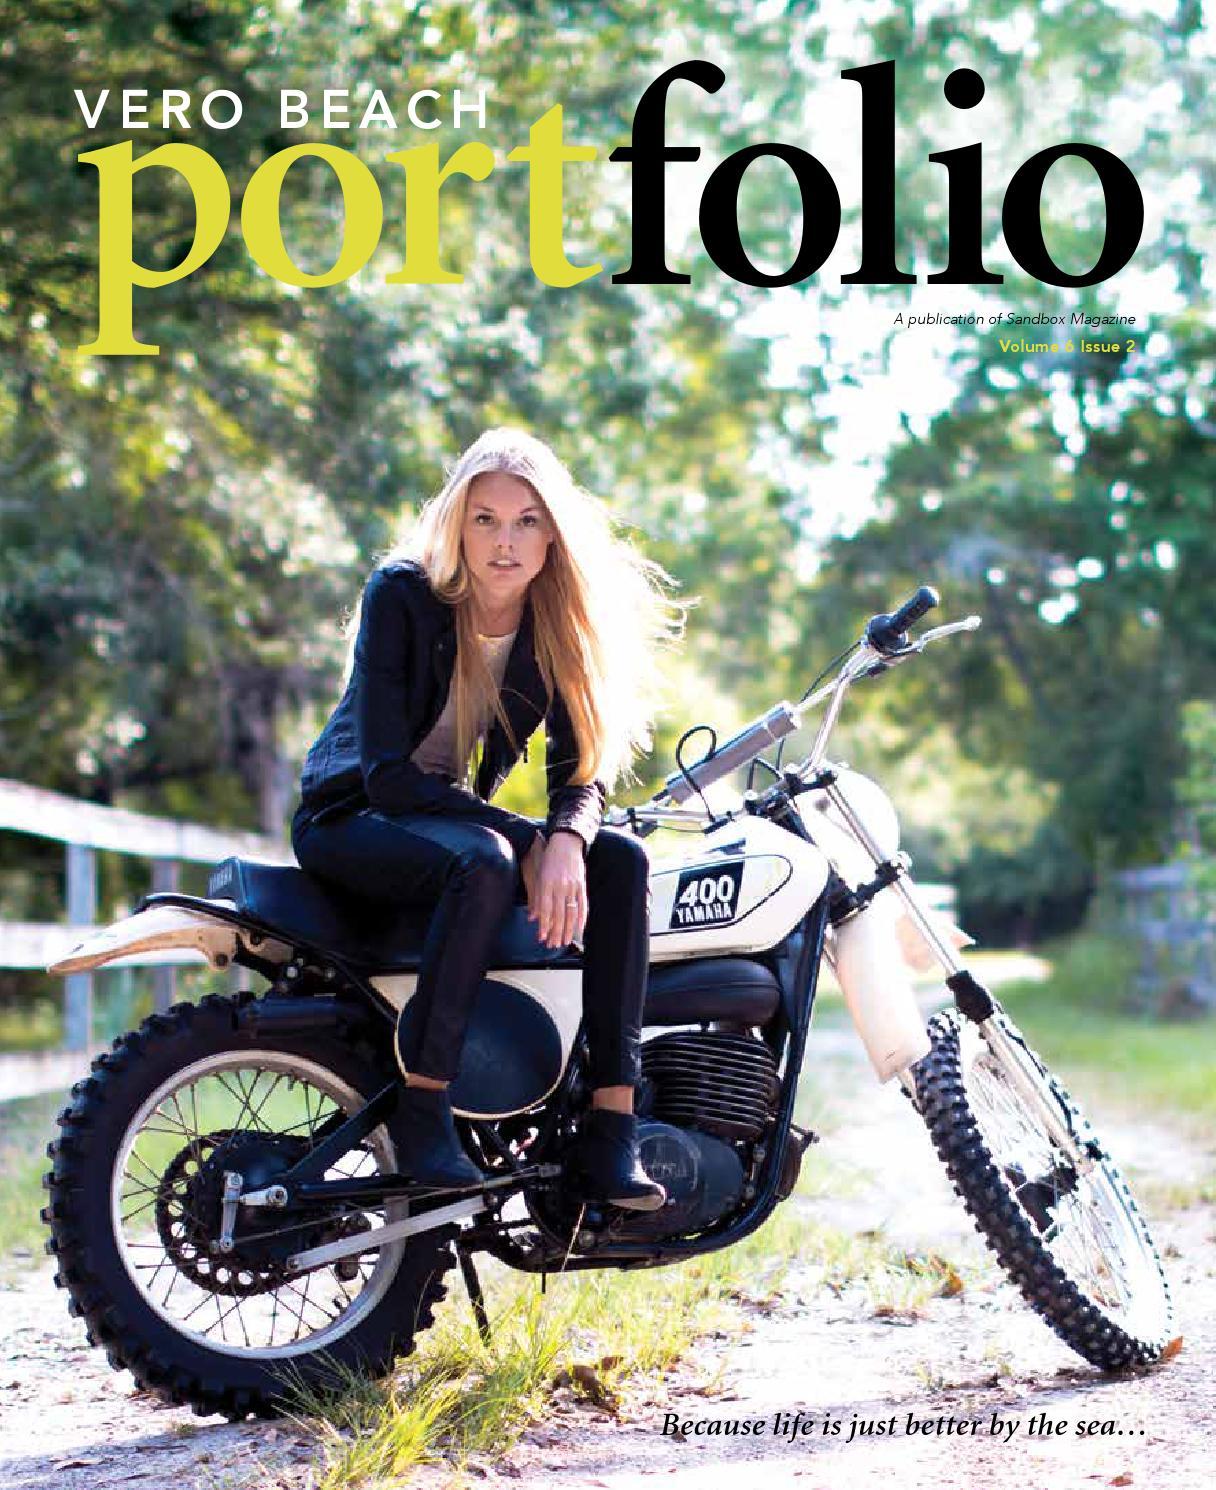 Vero Beach Portfolio Magazine March April 2016 Edition By Vero Beach Portfolio Magazine Issuu